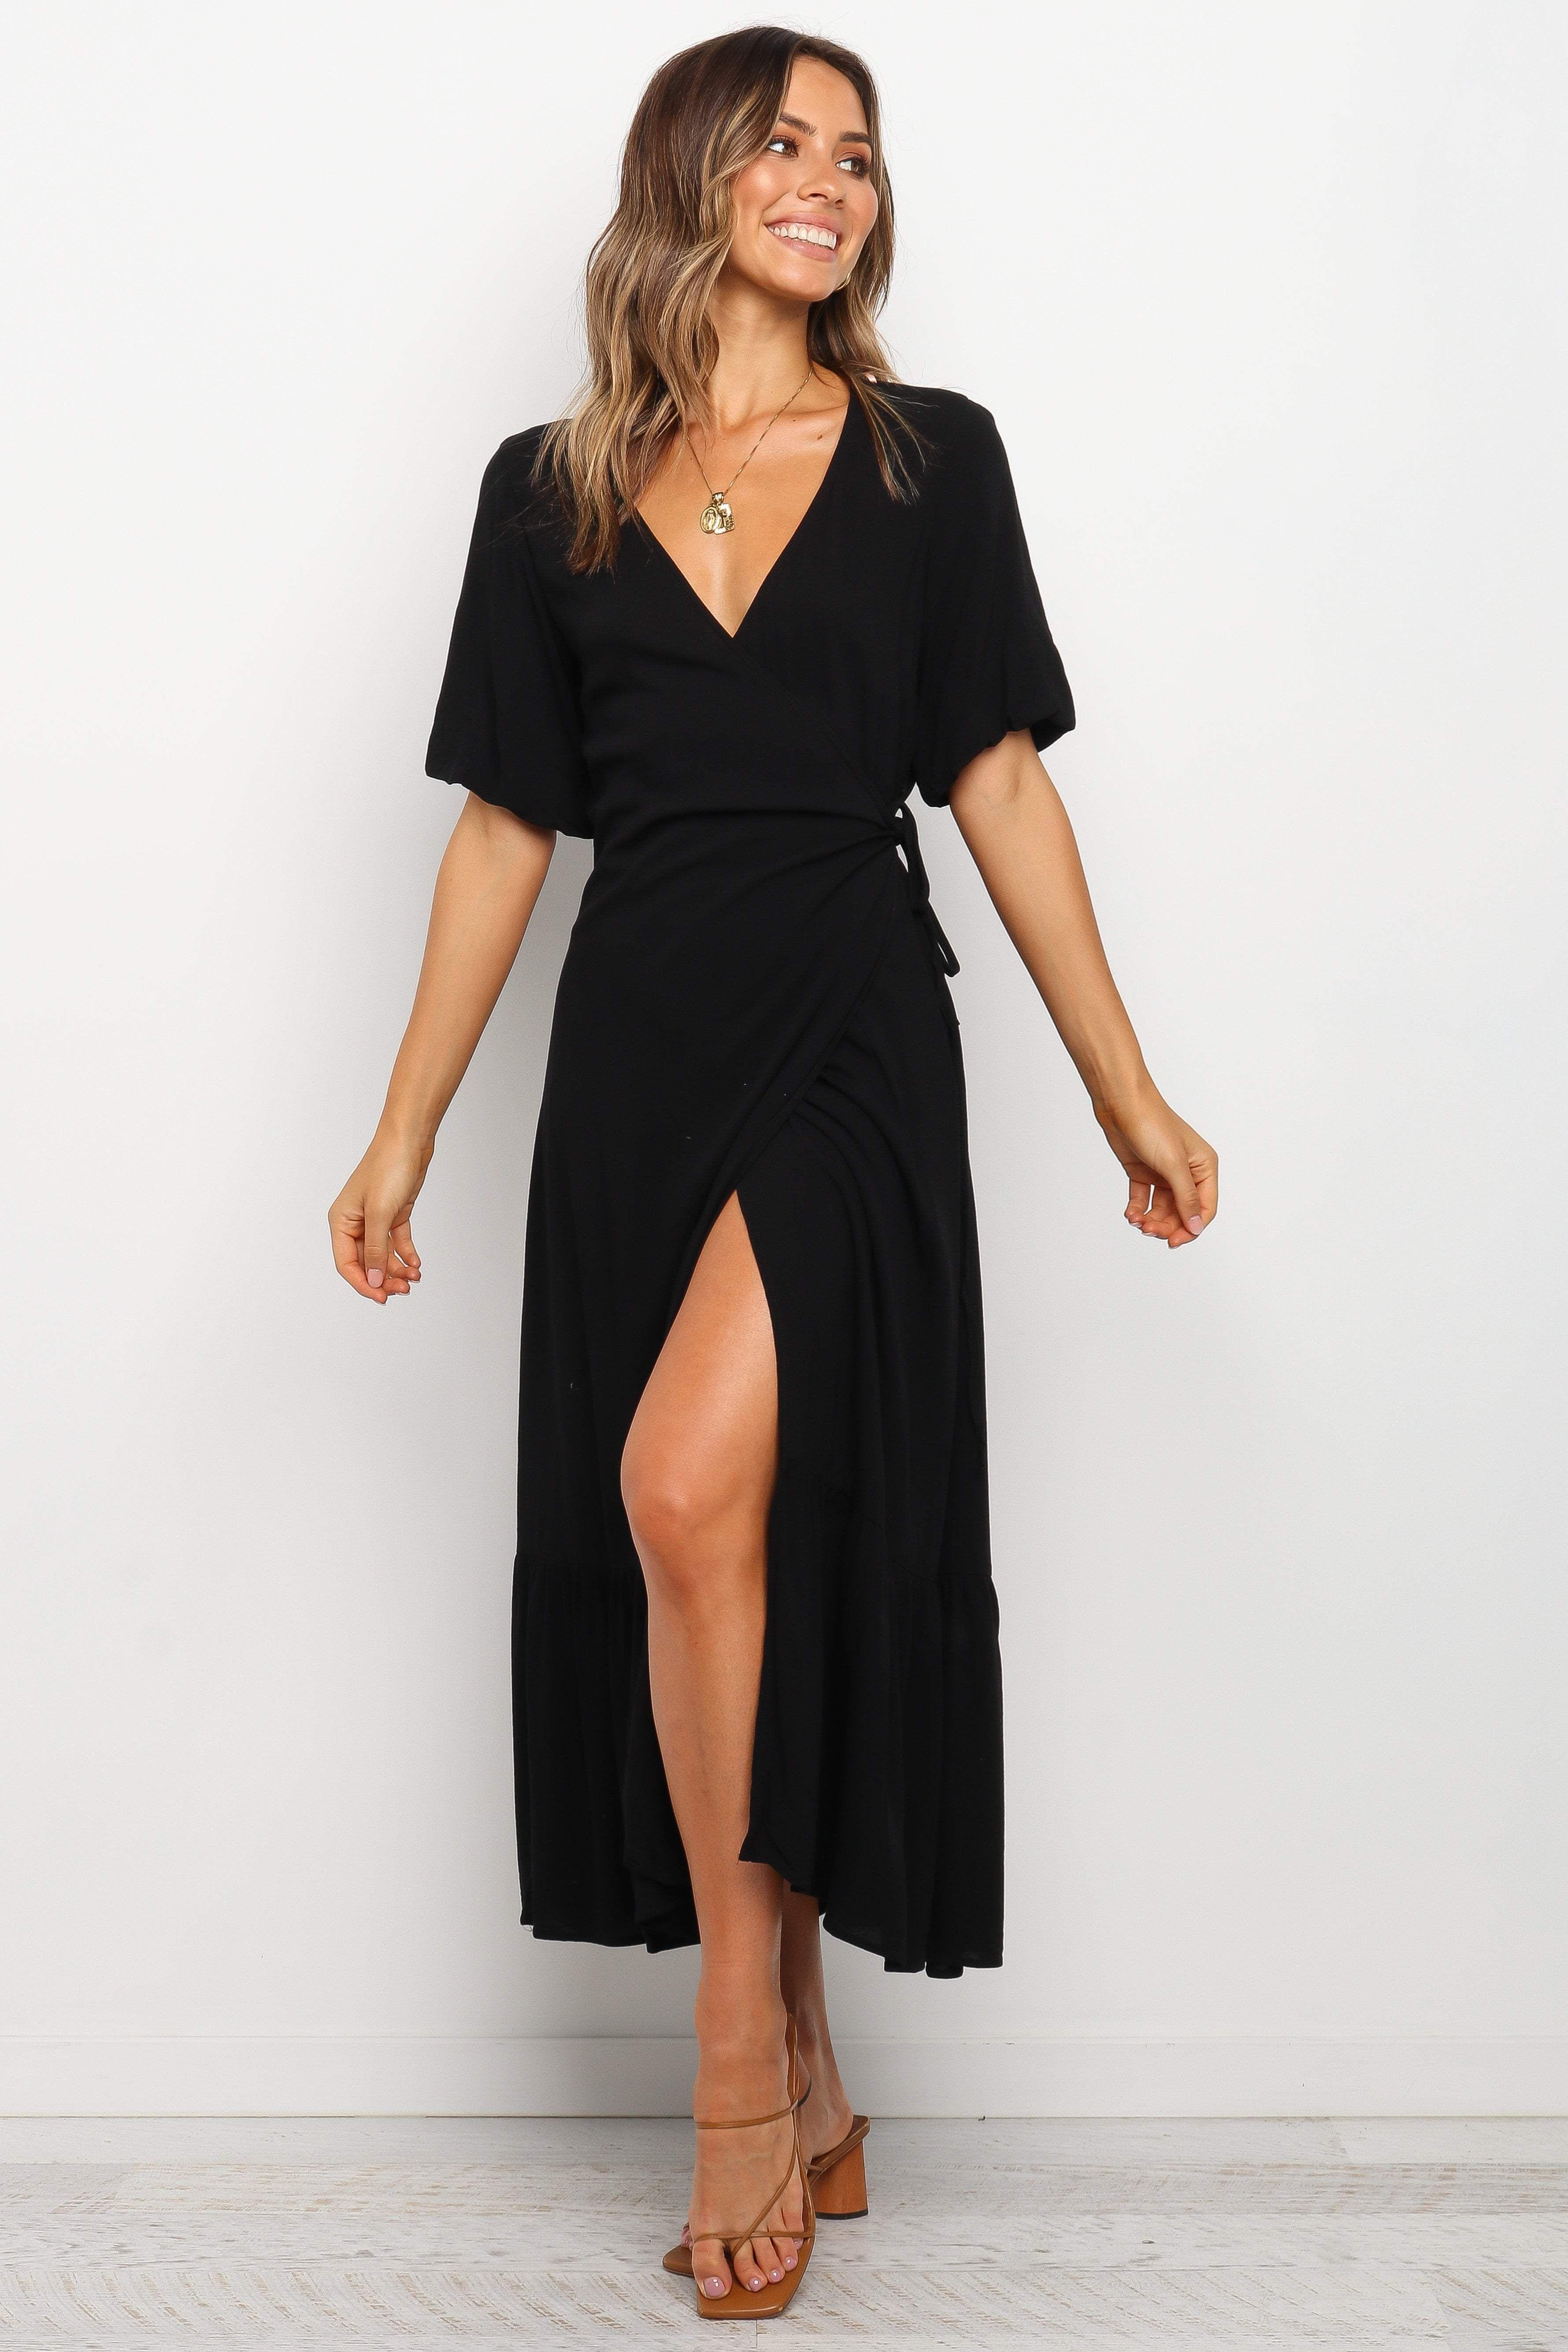 Bunya Dress Black 8 Wrap Dresses Summer Casual Dresses Black Short Dress [ 5338 x 3559 Pixel ]